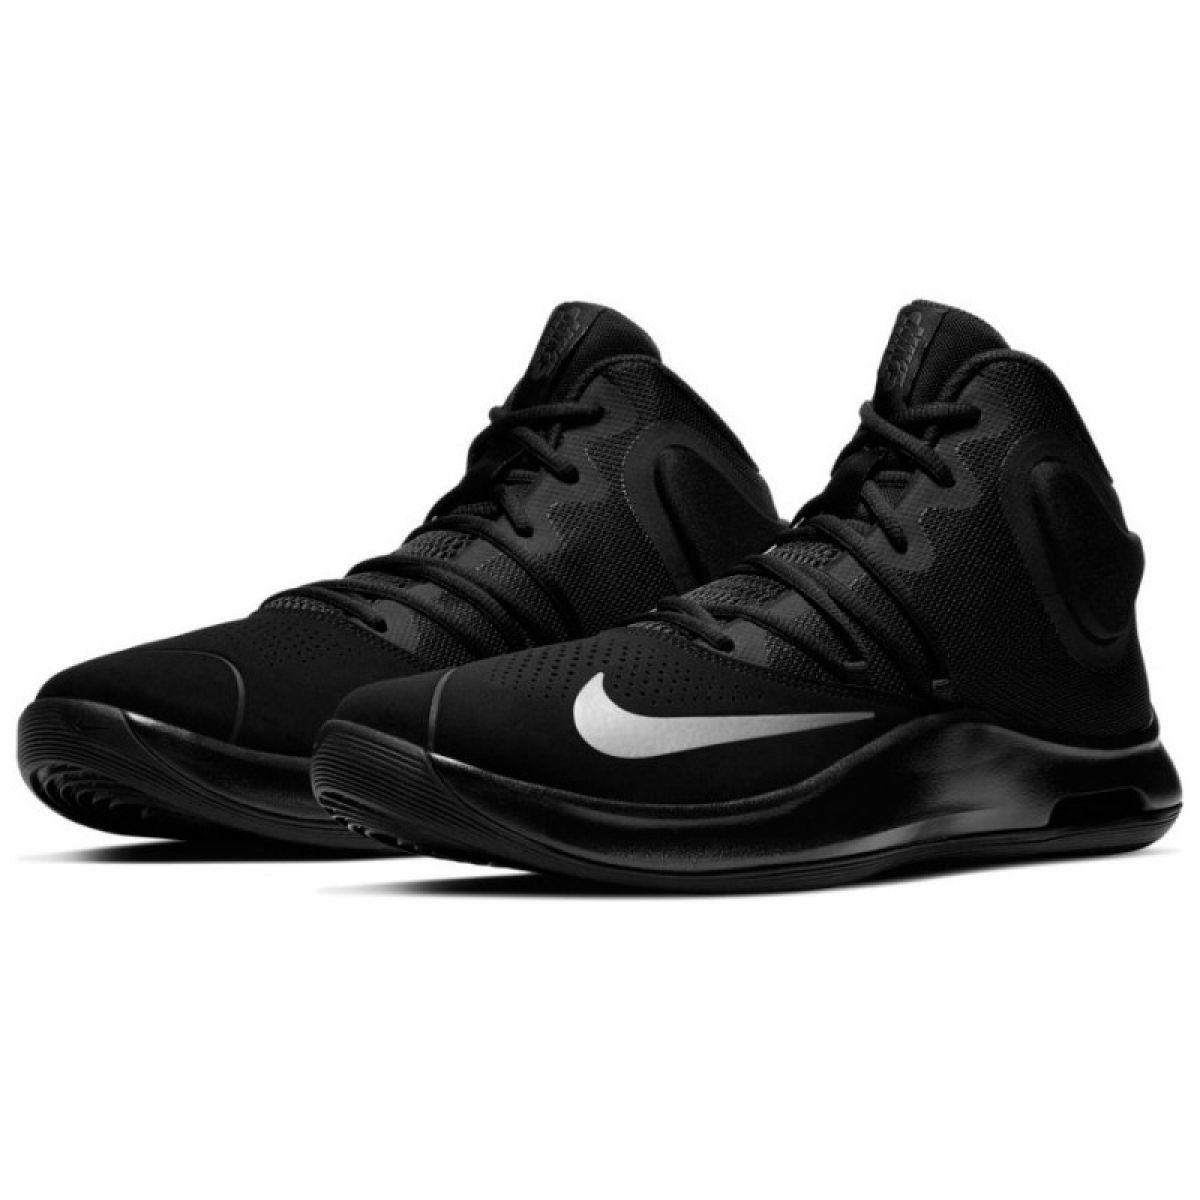 Buty Nike Air Versitile Iv Nbk M Cj6703 001 Czarne Nike Nike Air Black Shoes